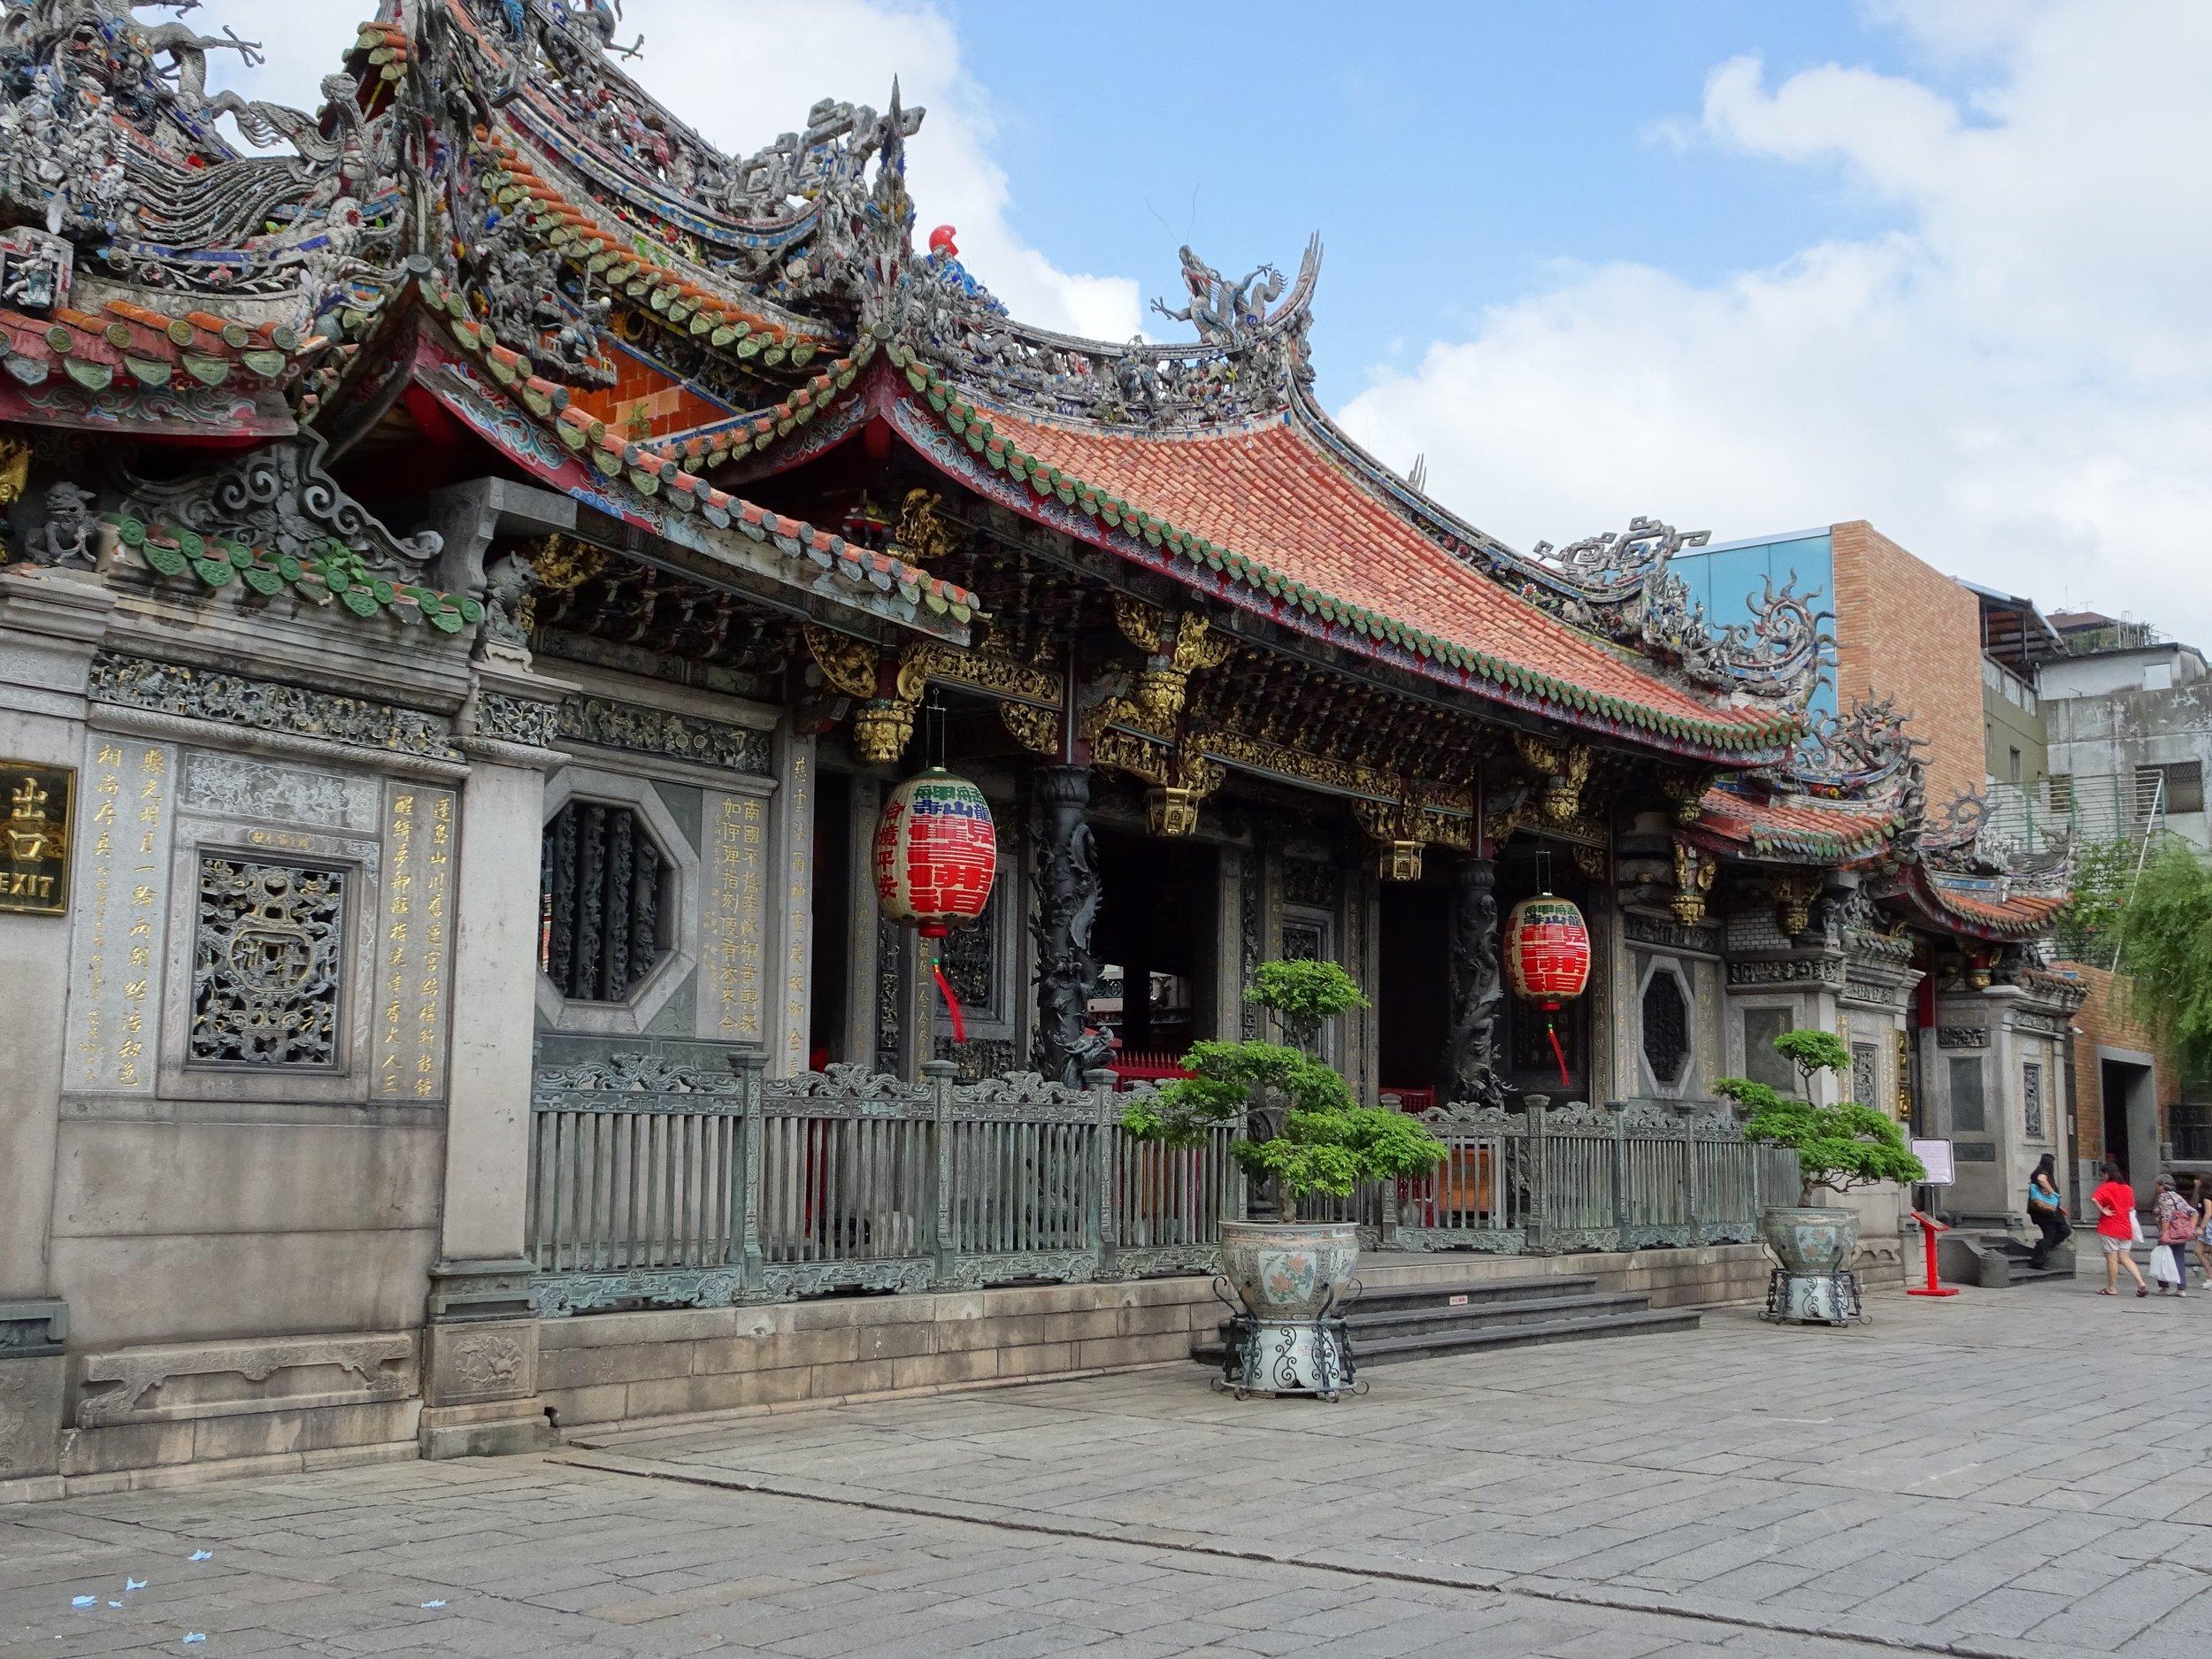 lungshan temple, taipei, taiwan - m.quigley